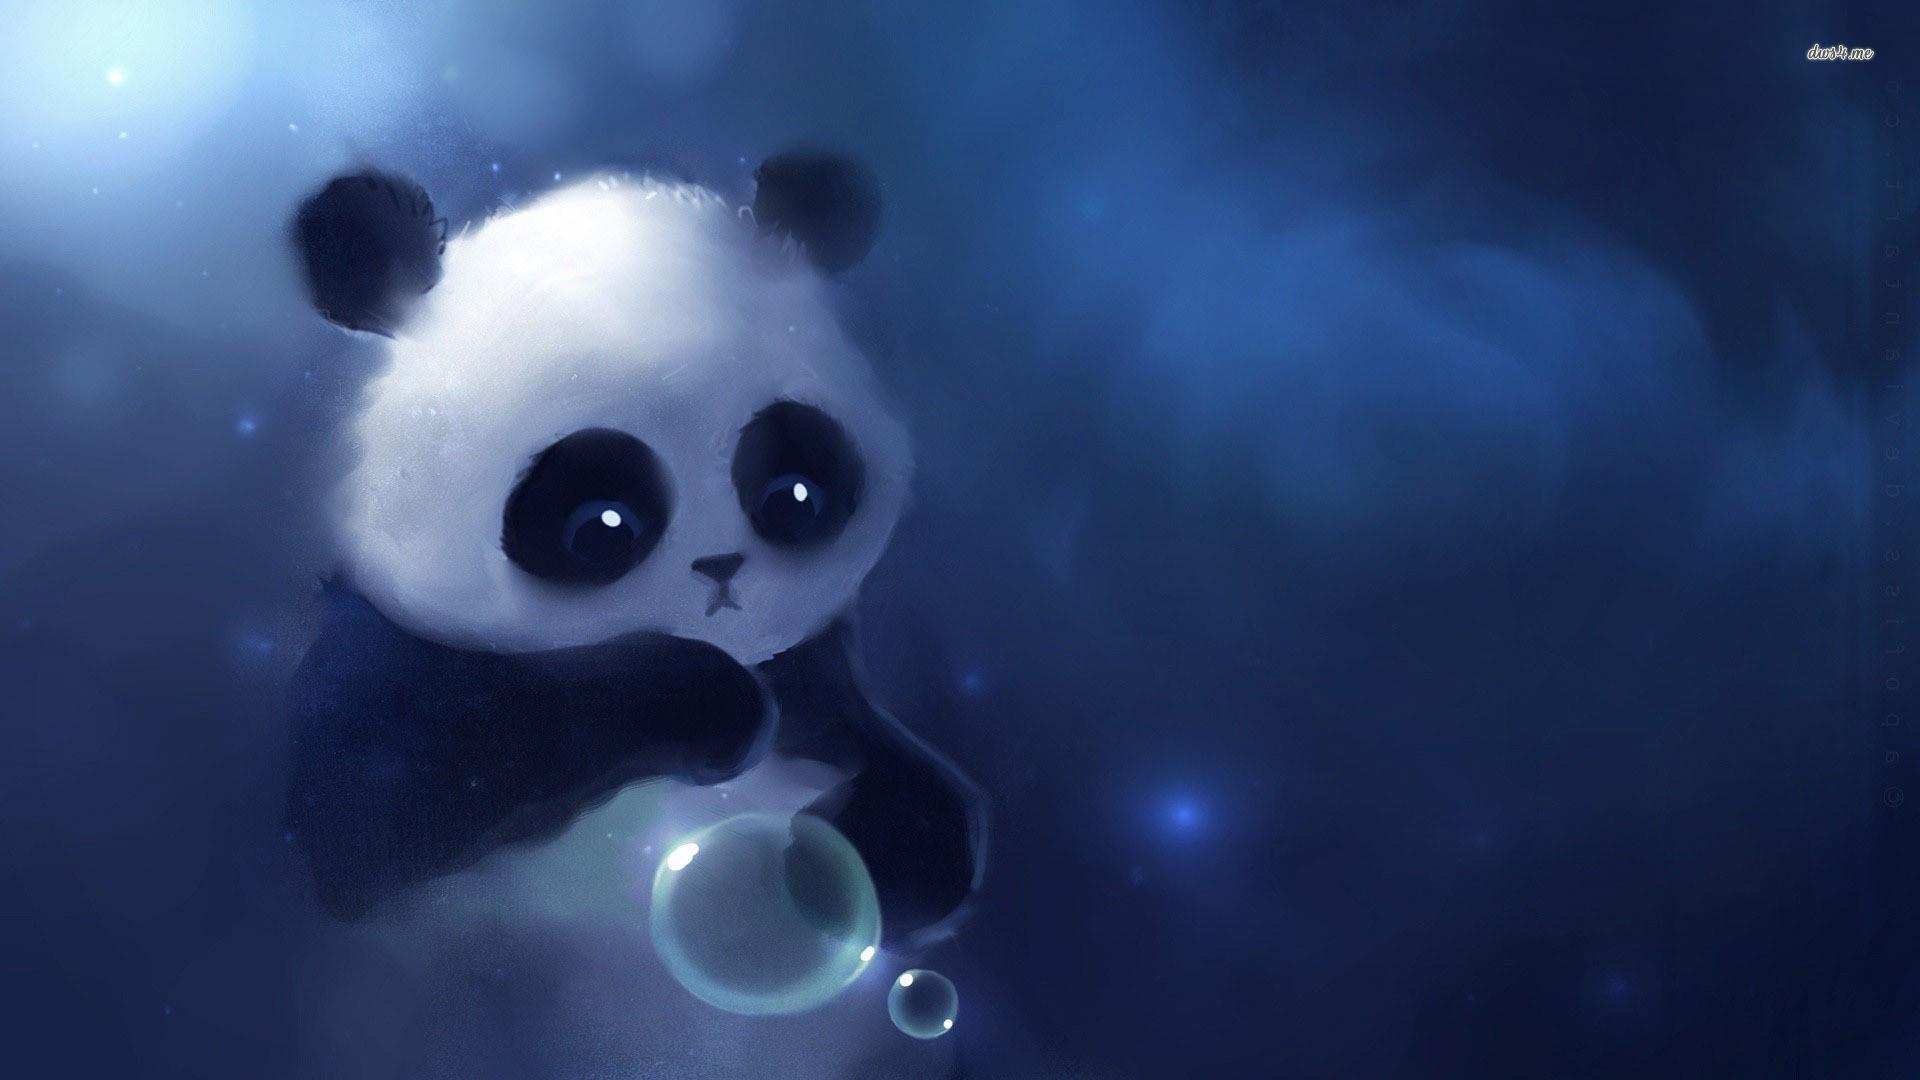 Download Wallpaper Koala Cartoon - 507384  Picture_431142   .jpg